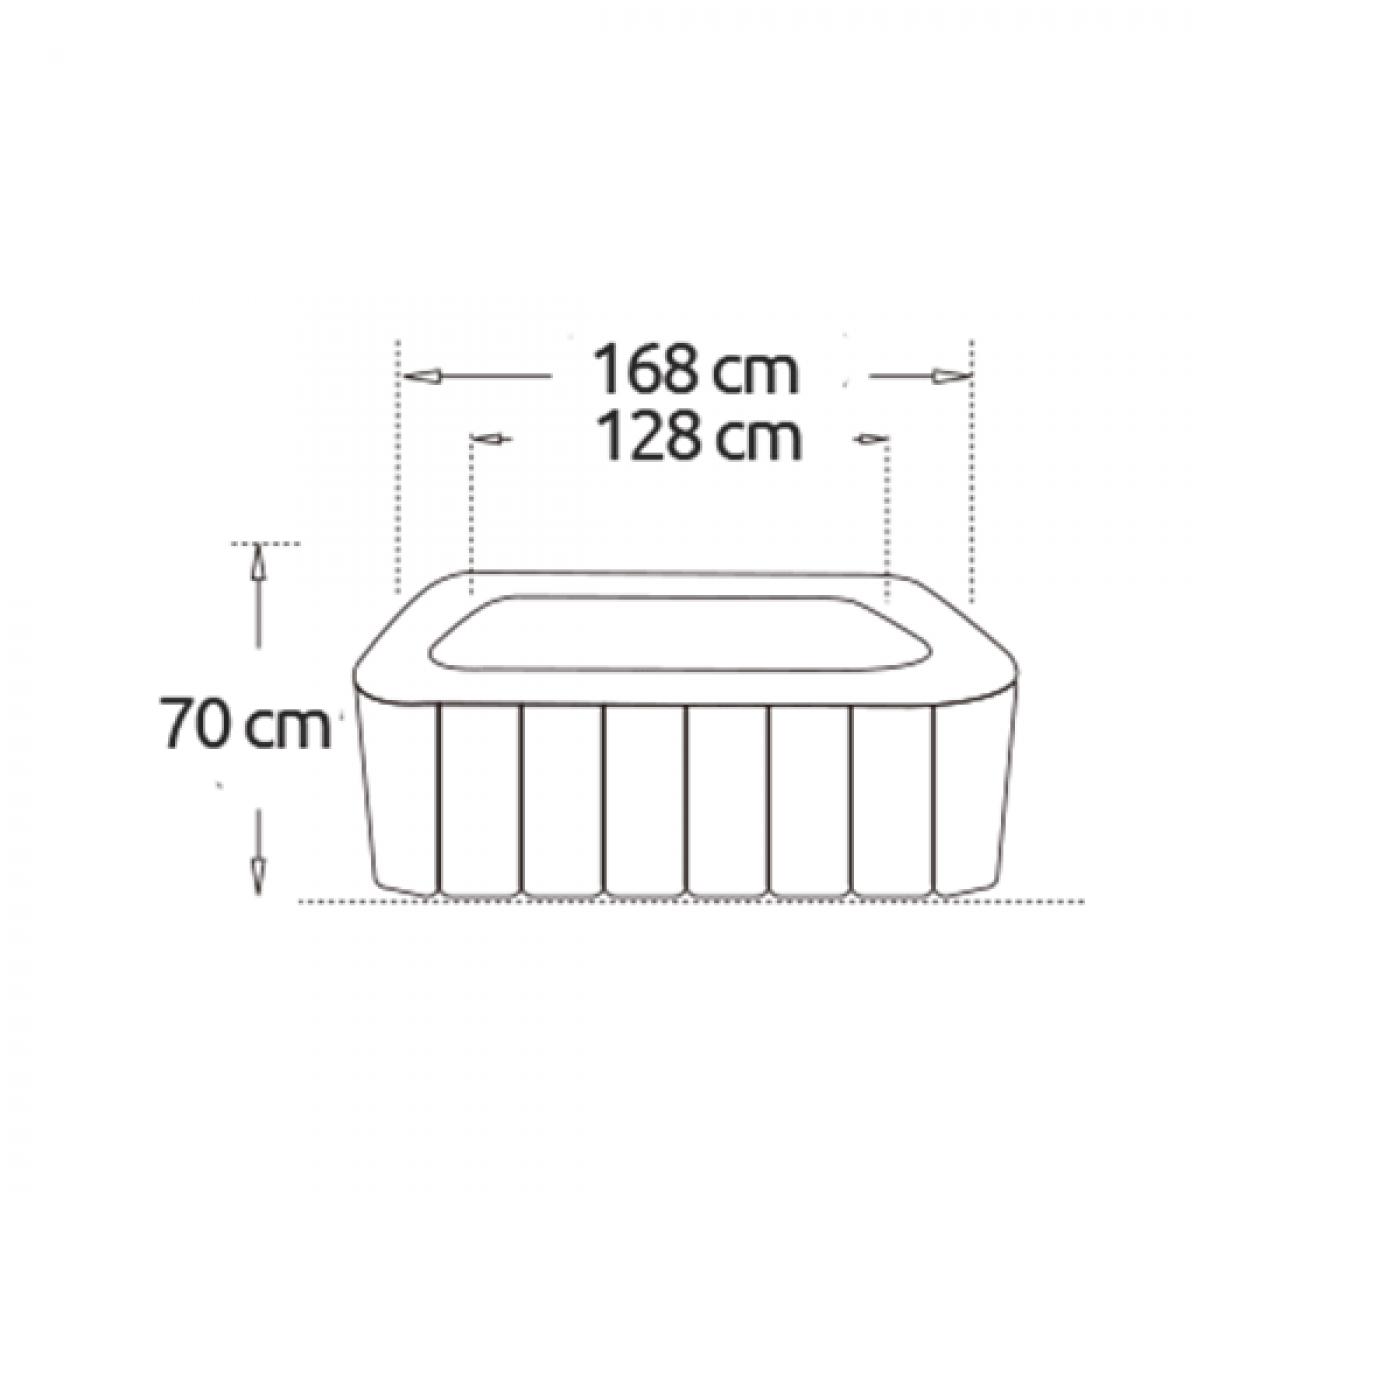 Piscina idromassaggio CAIMAN gonfiabile Quadrata 4 Posti da esterno NETSPA